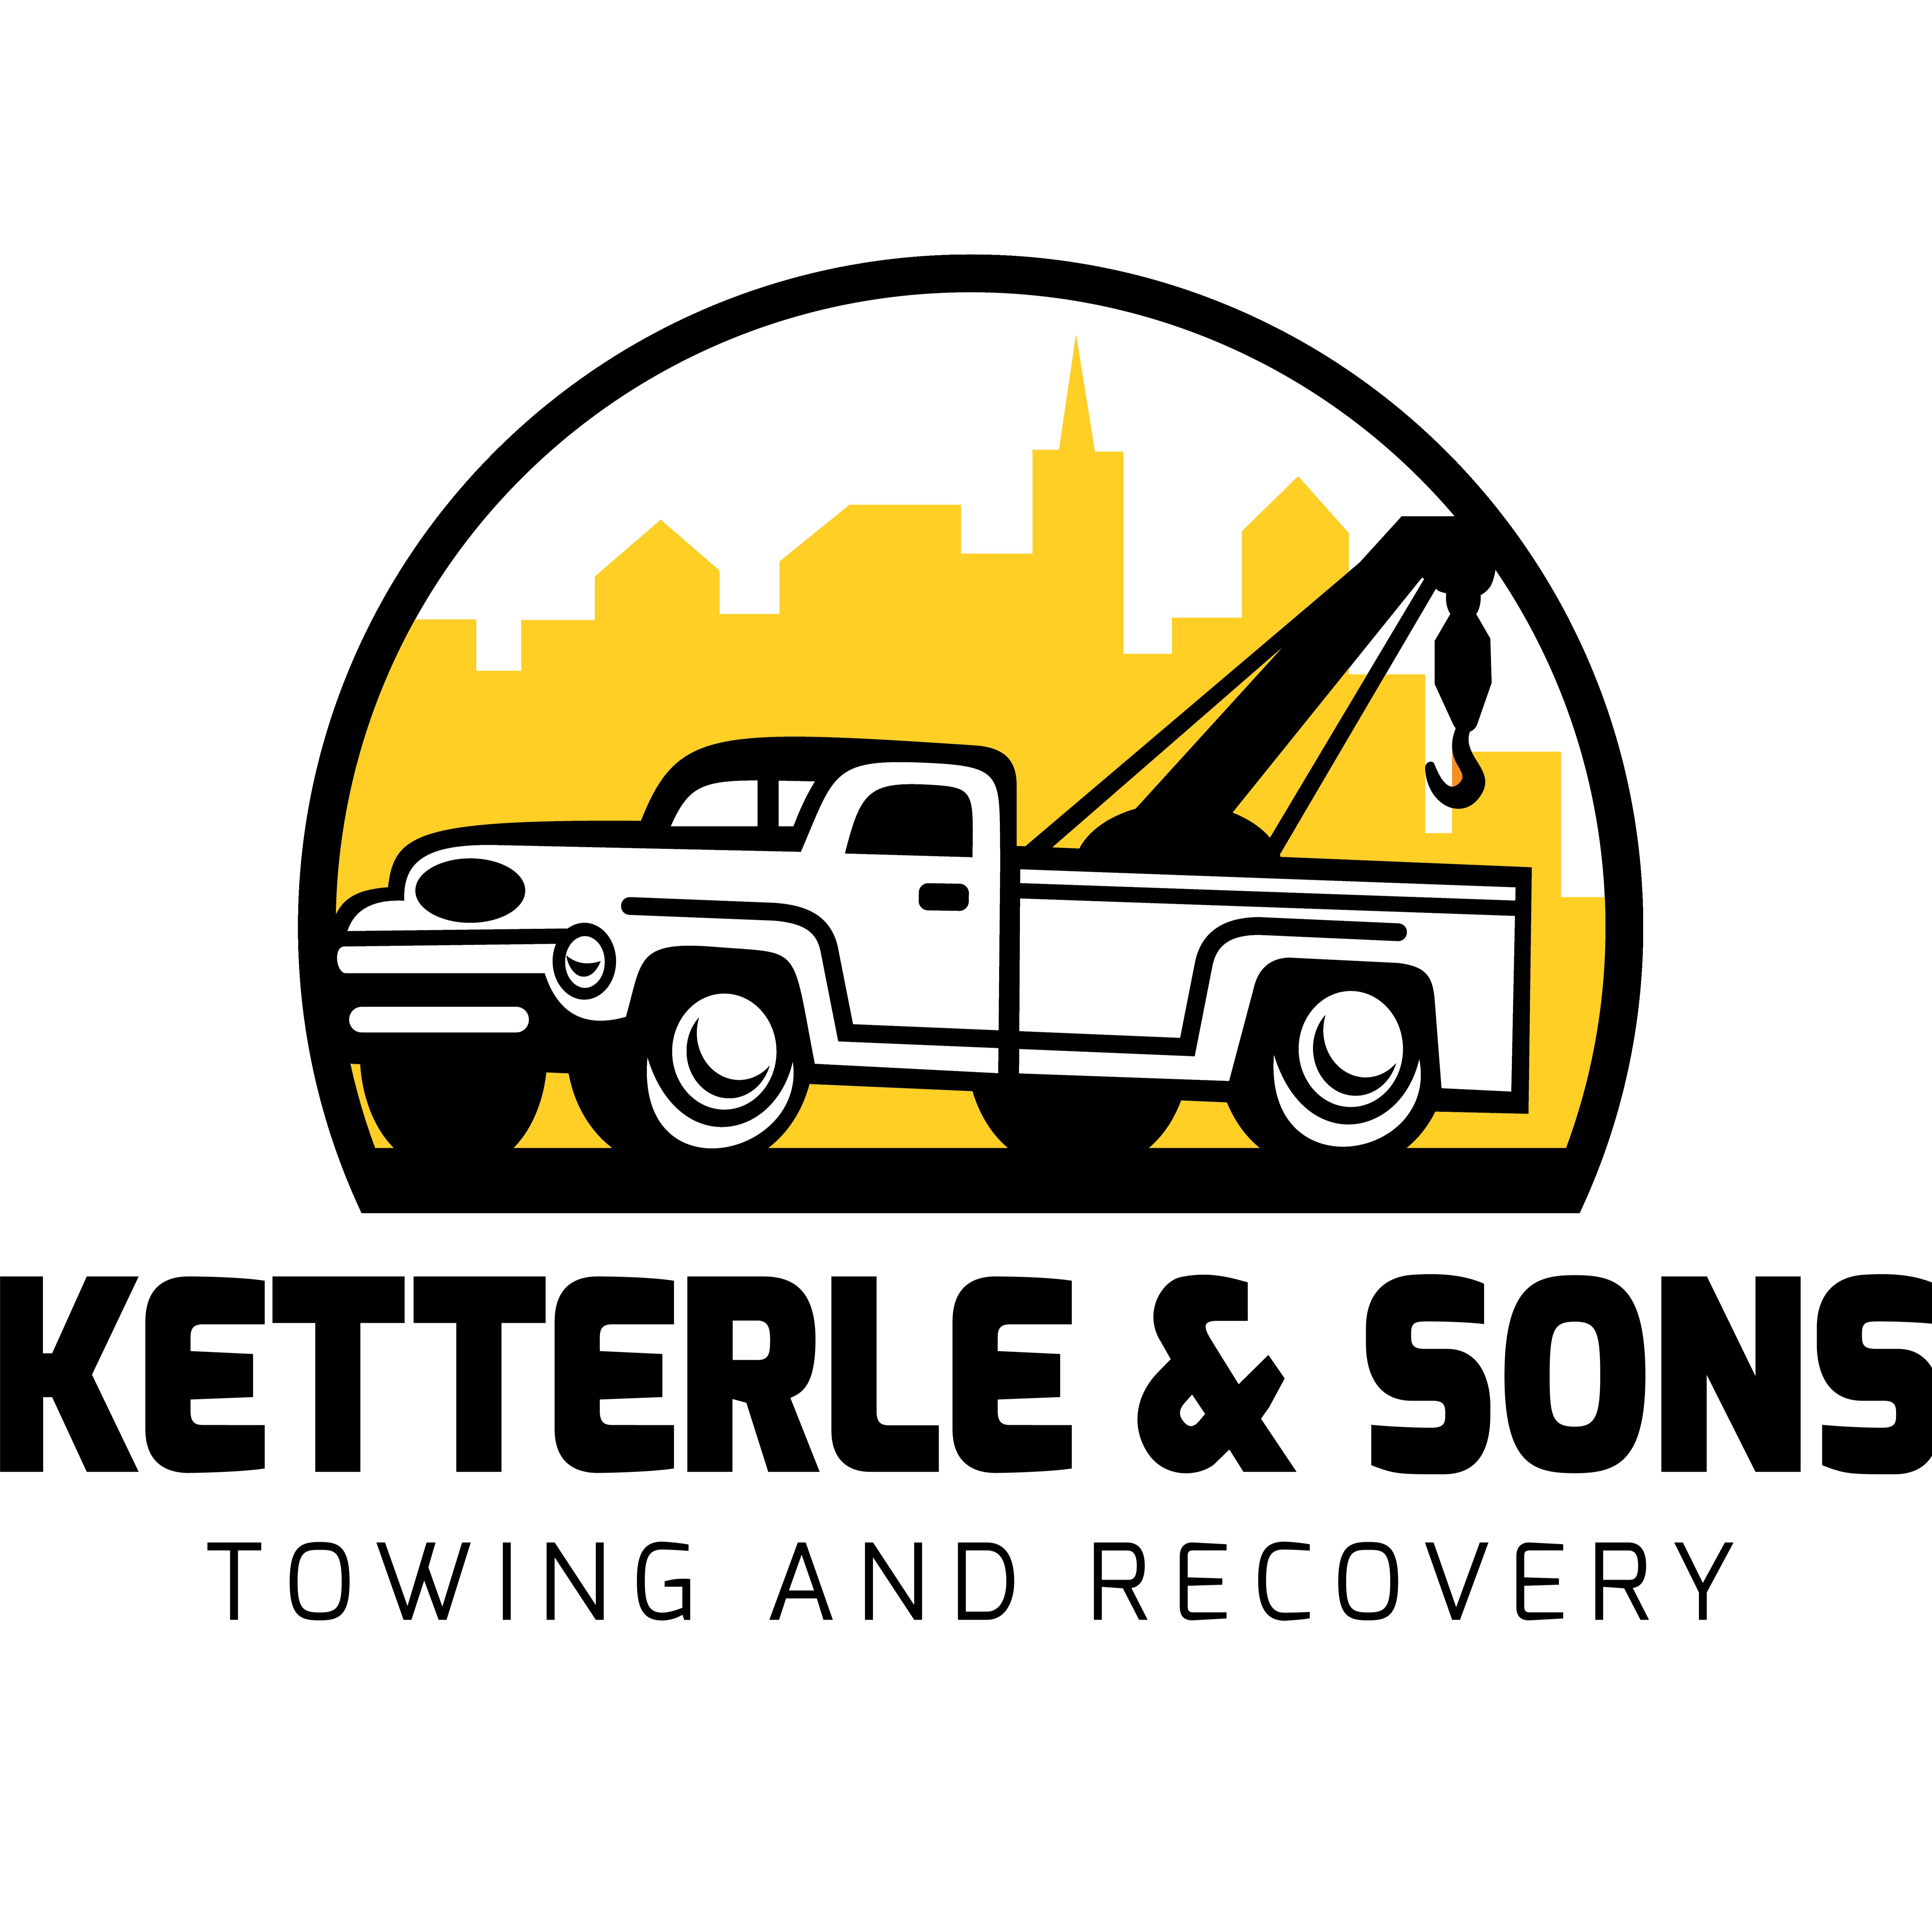 KETTERLE & SONS logo